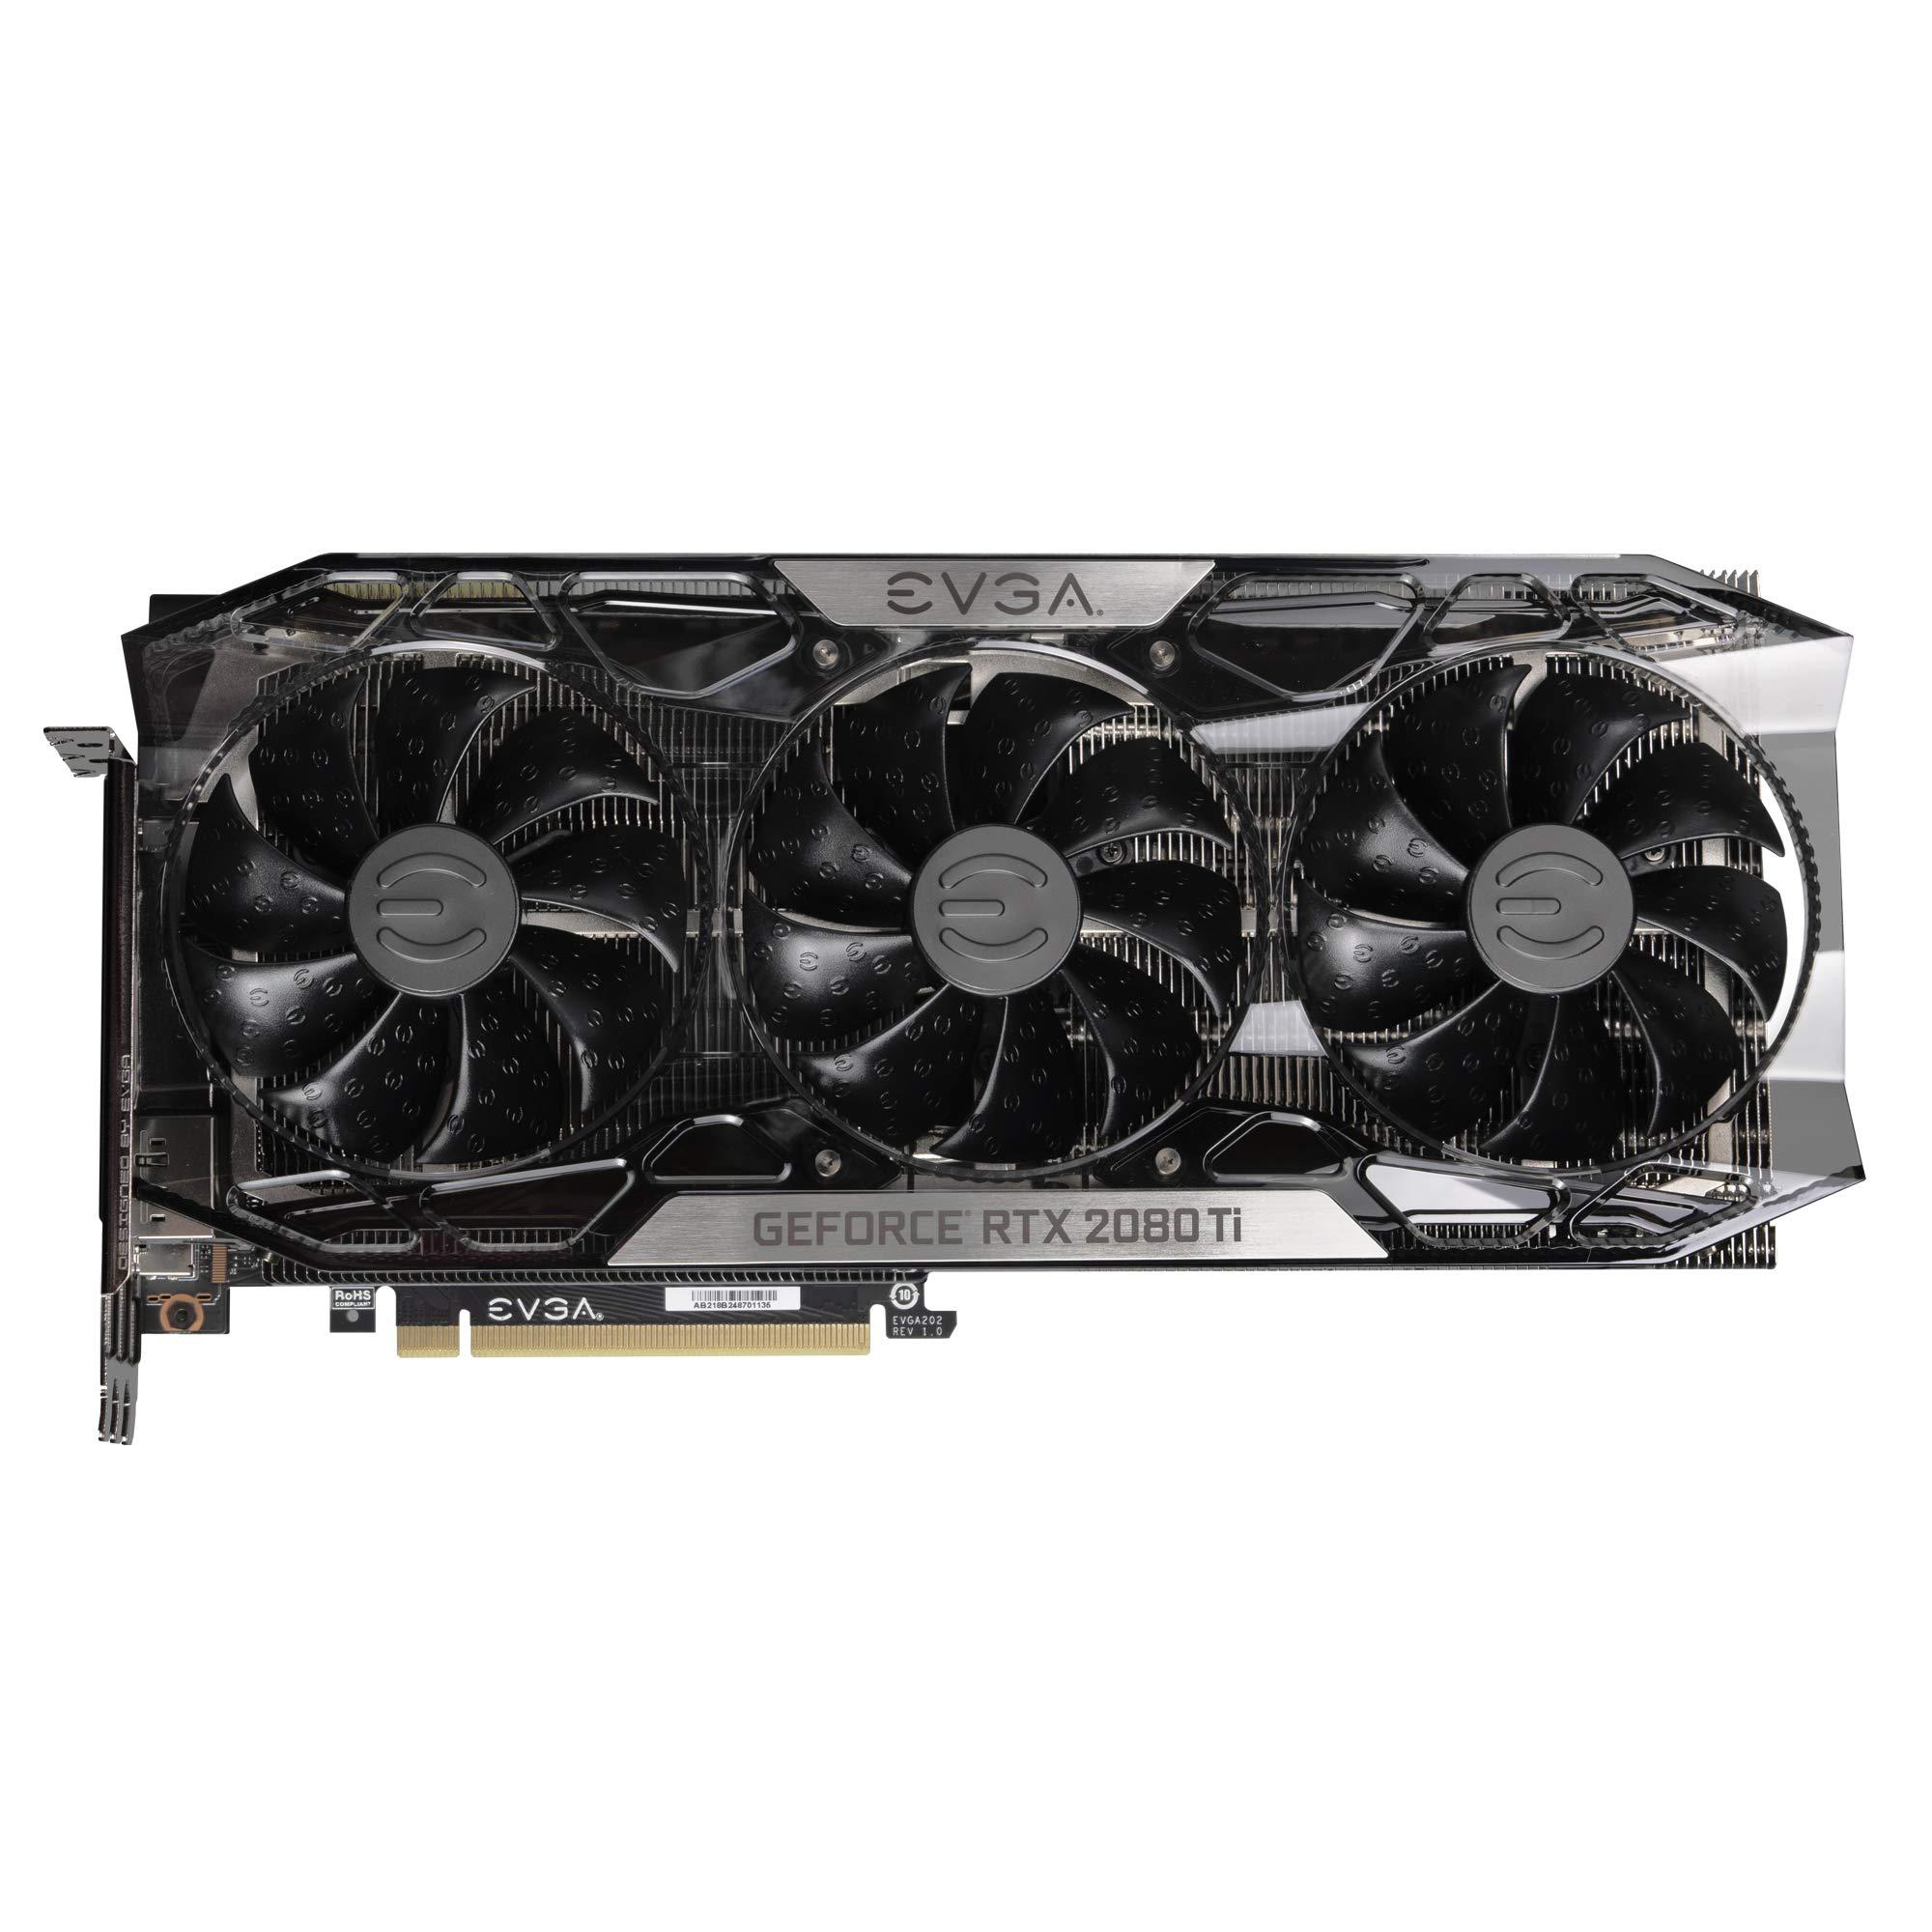 EVGA GeForce RTX 2080 Ti FTW3 Ultra Gaming, 11GB GDDR6, iCX2 & RGB LED Graphics Card 11G-P4-2487-KR by EVGA (Image #3)